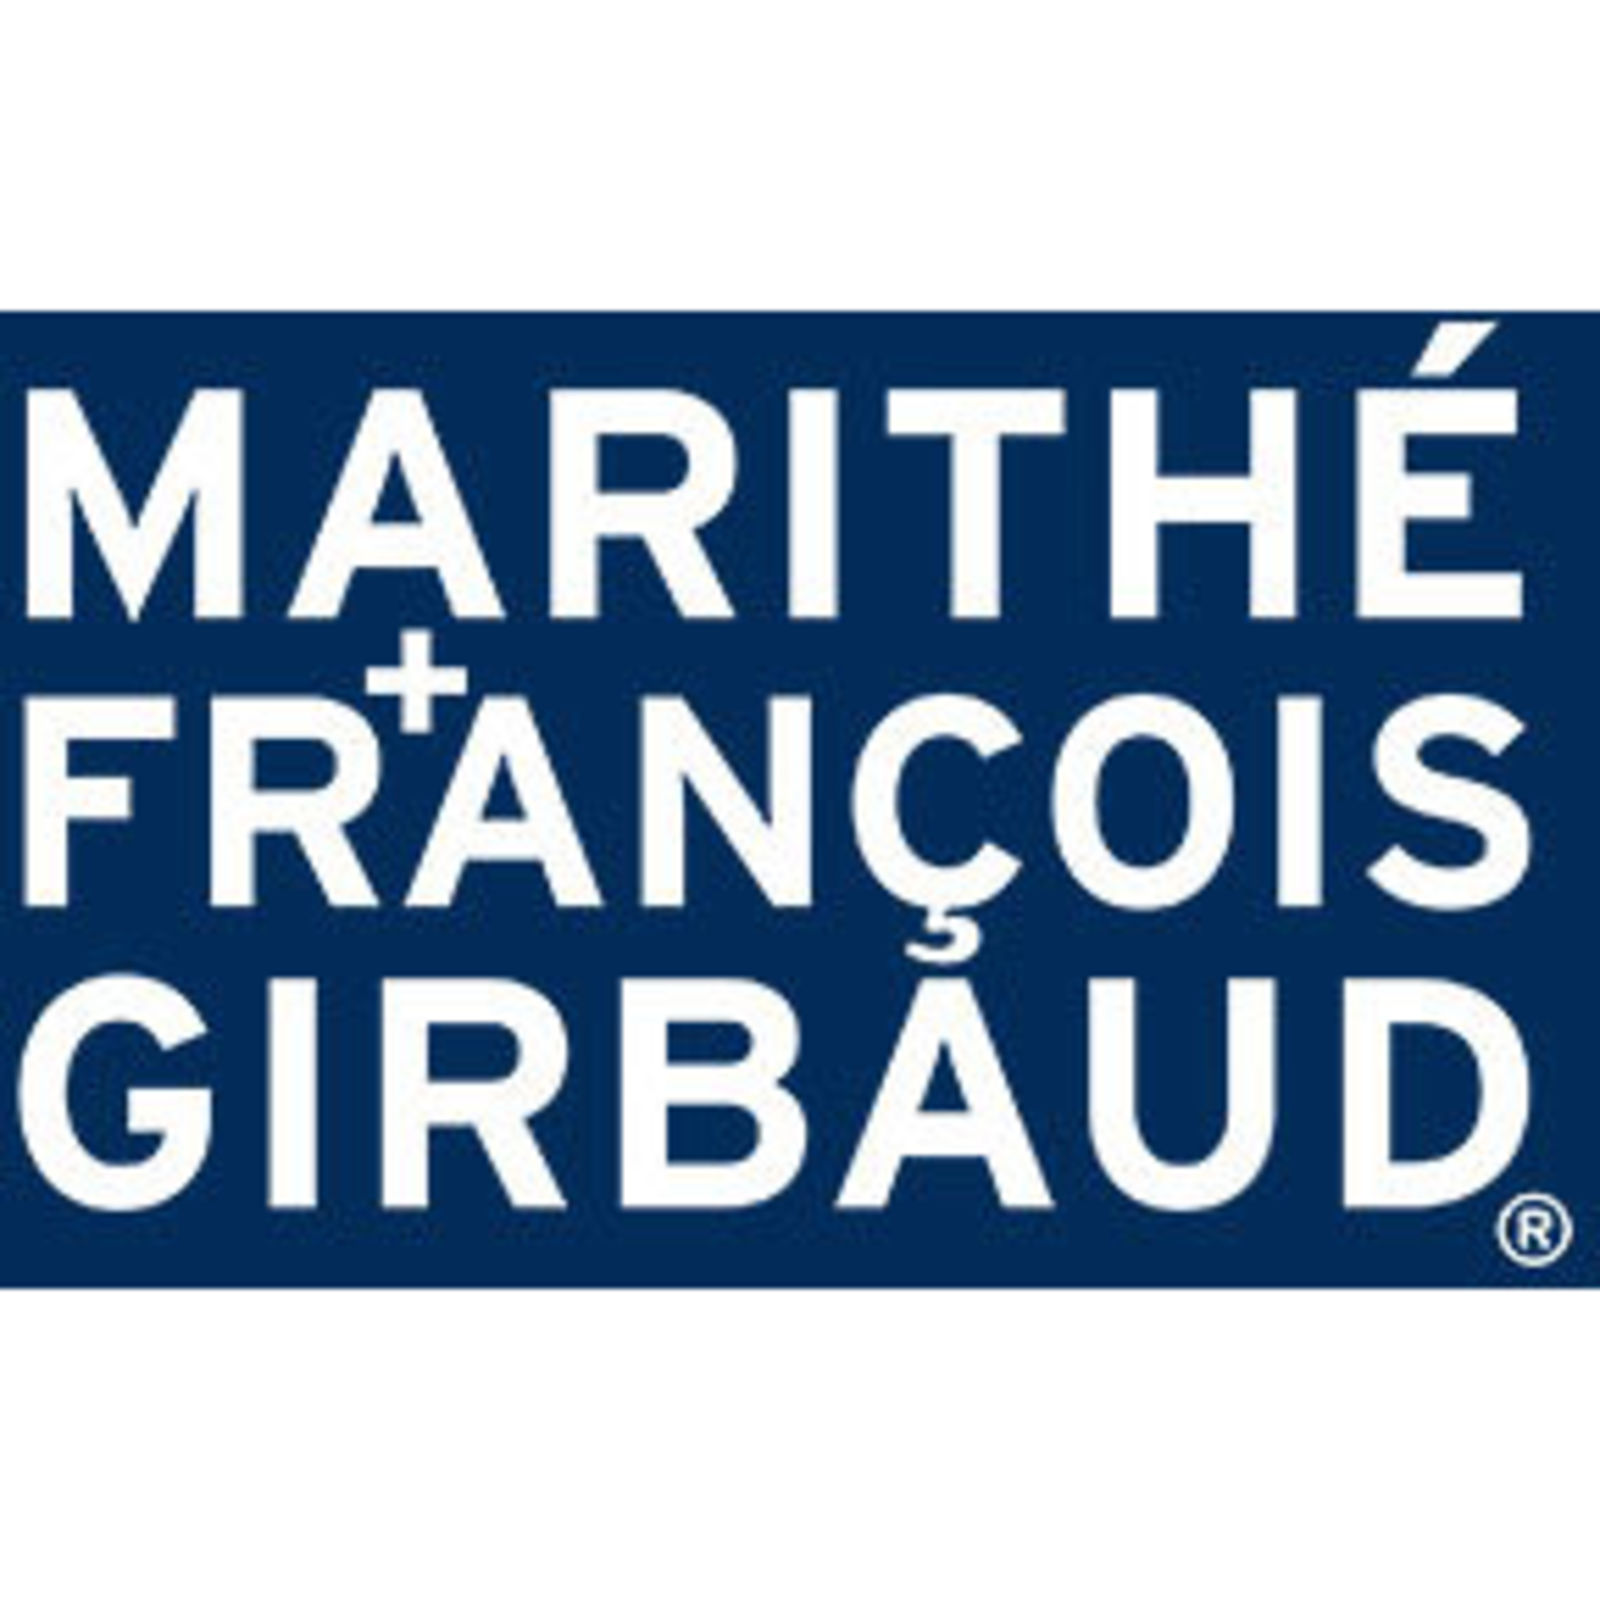 MARITHÈ + FRANCOIS GIRBAUD